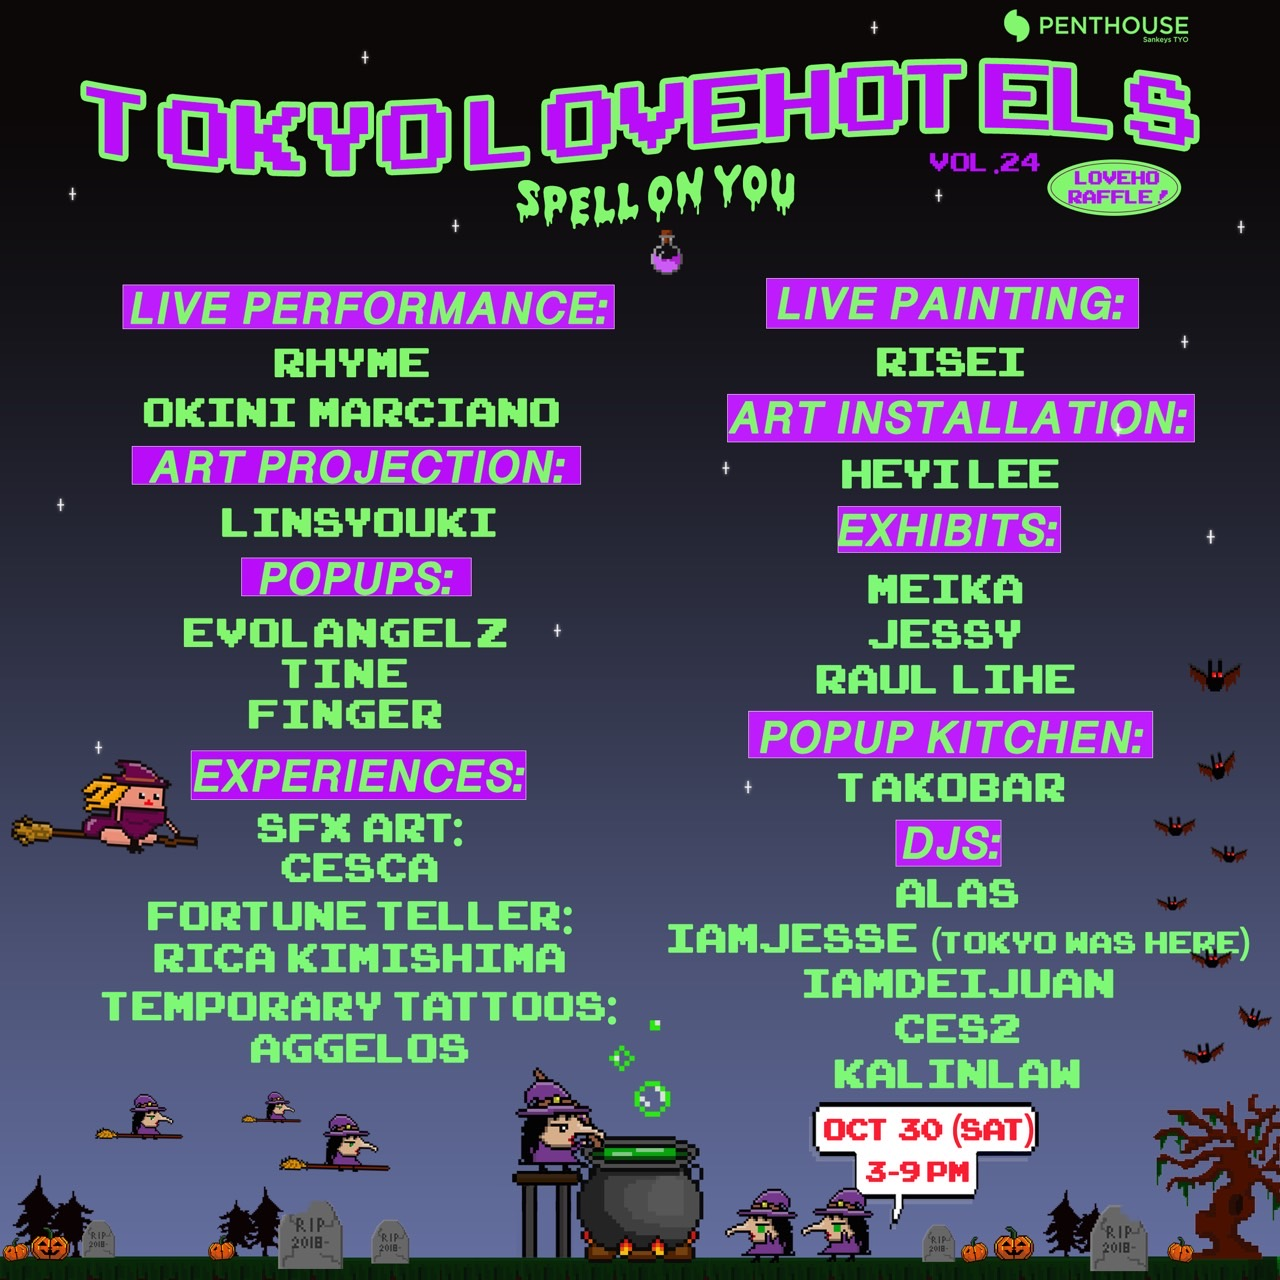 TOKYO LOVEHOTELS Vol.24 #SPELLONYOU